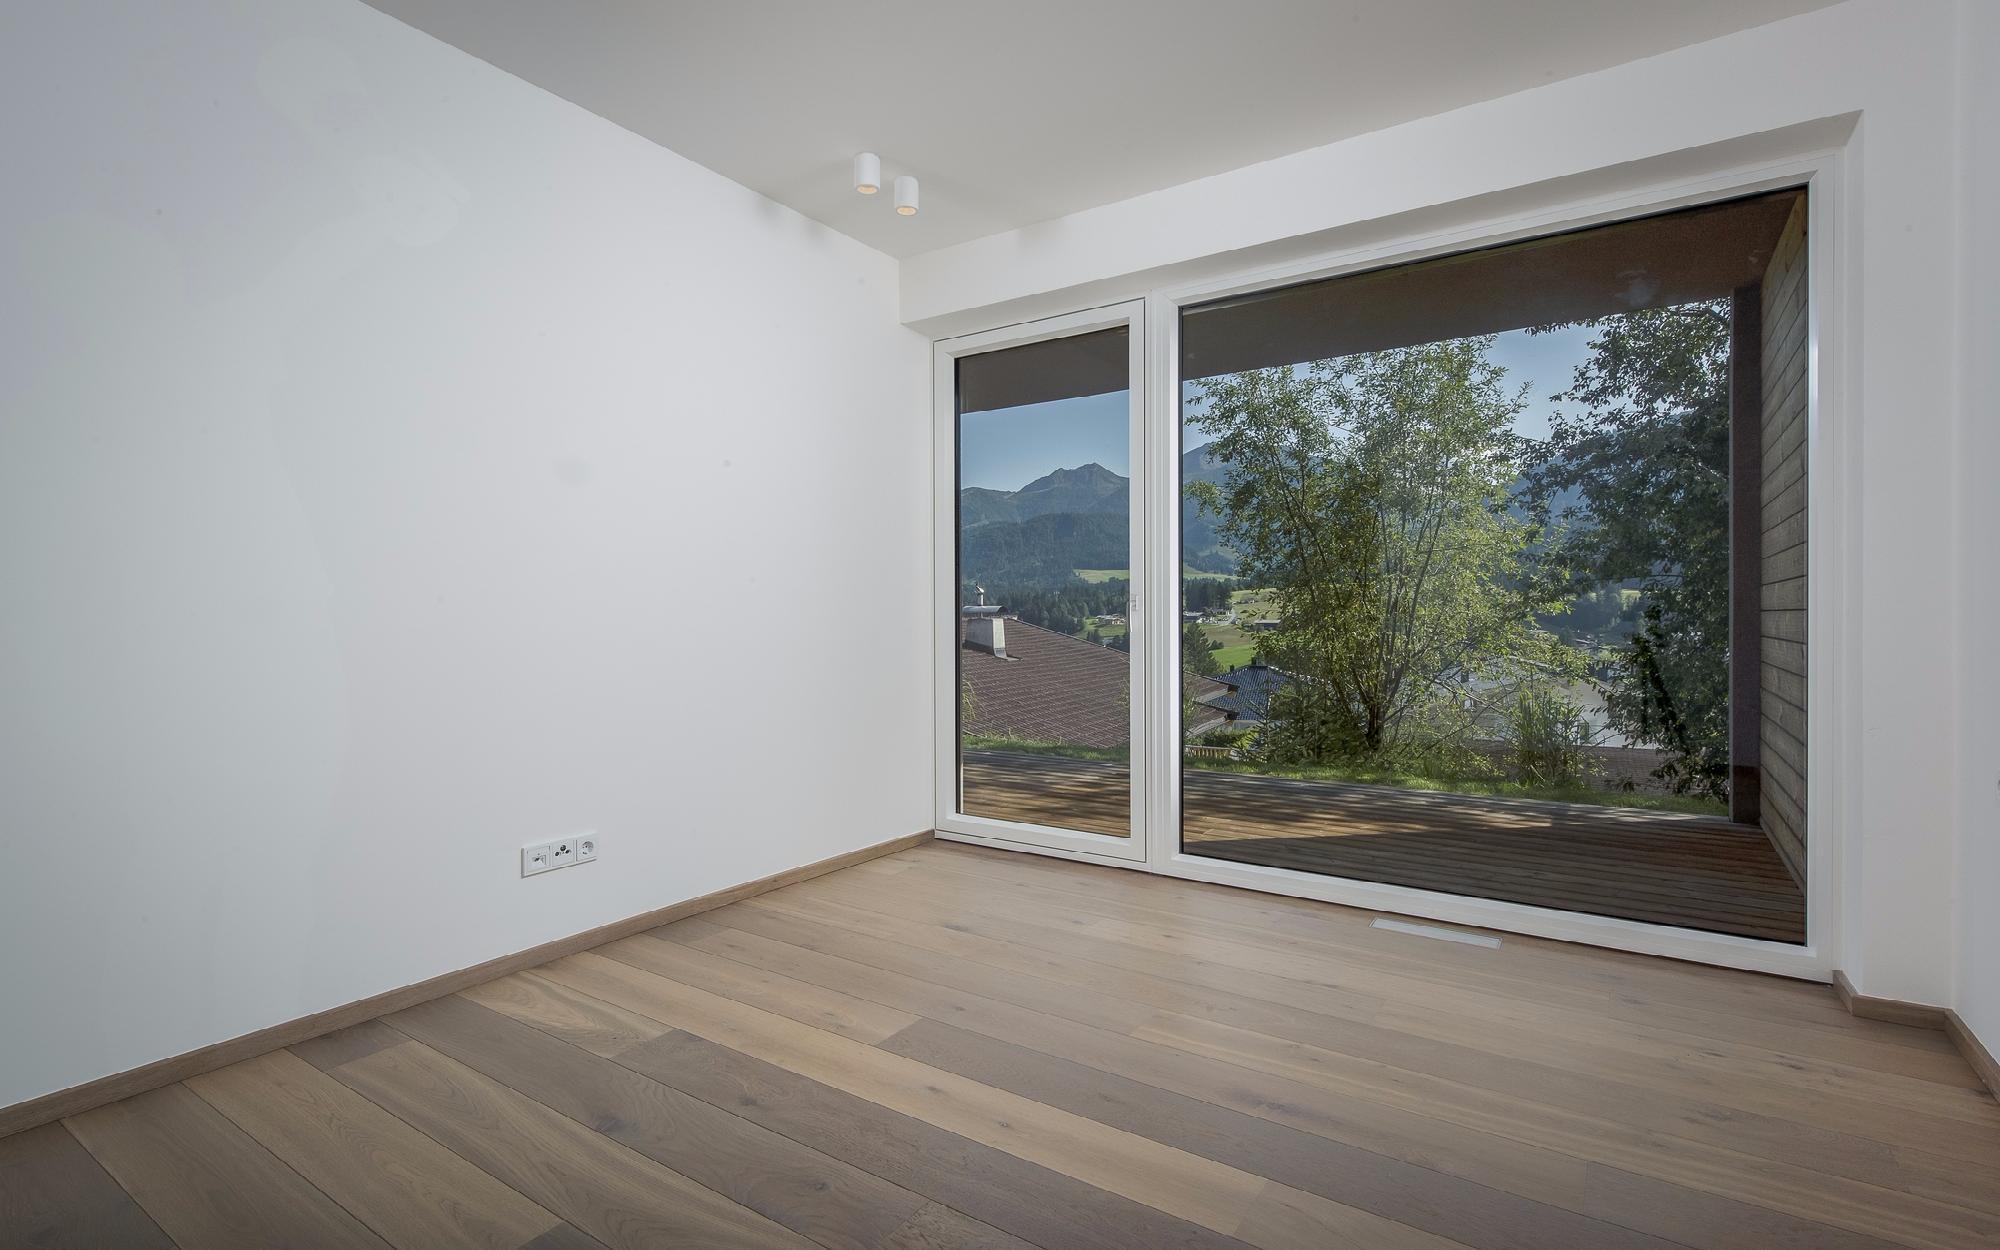 Премиум апартаменты класса люкс в Фибербрунне на продажу, Фибербрунн